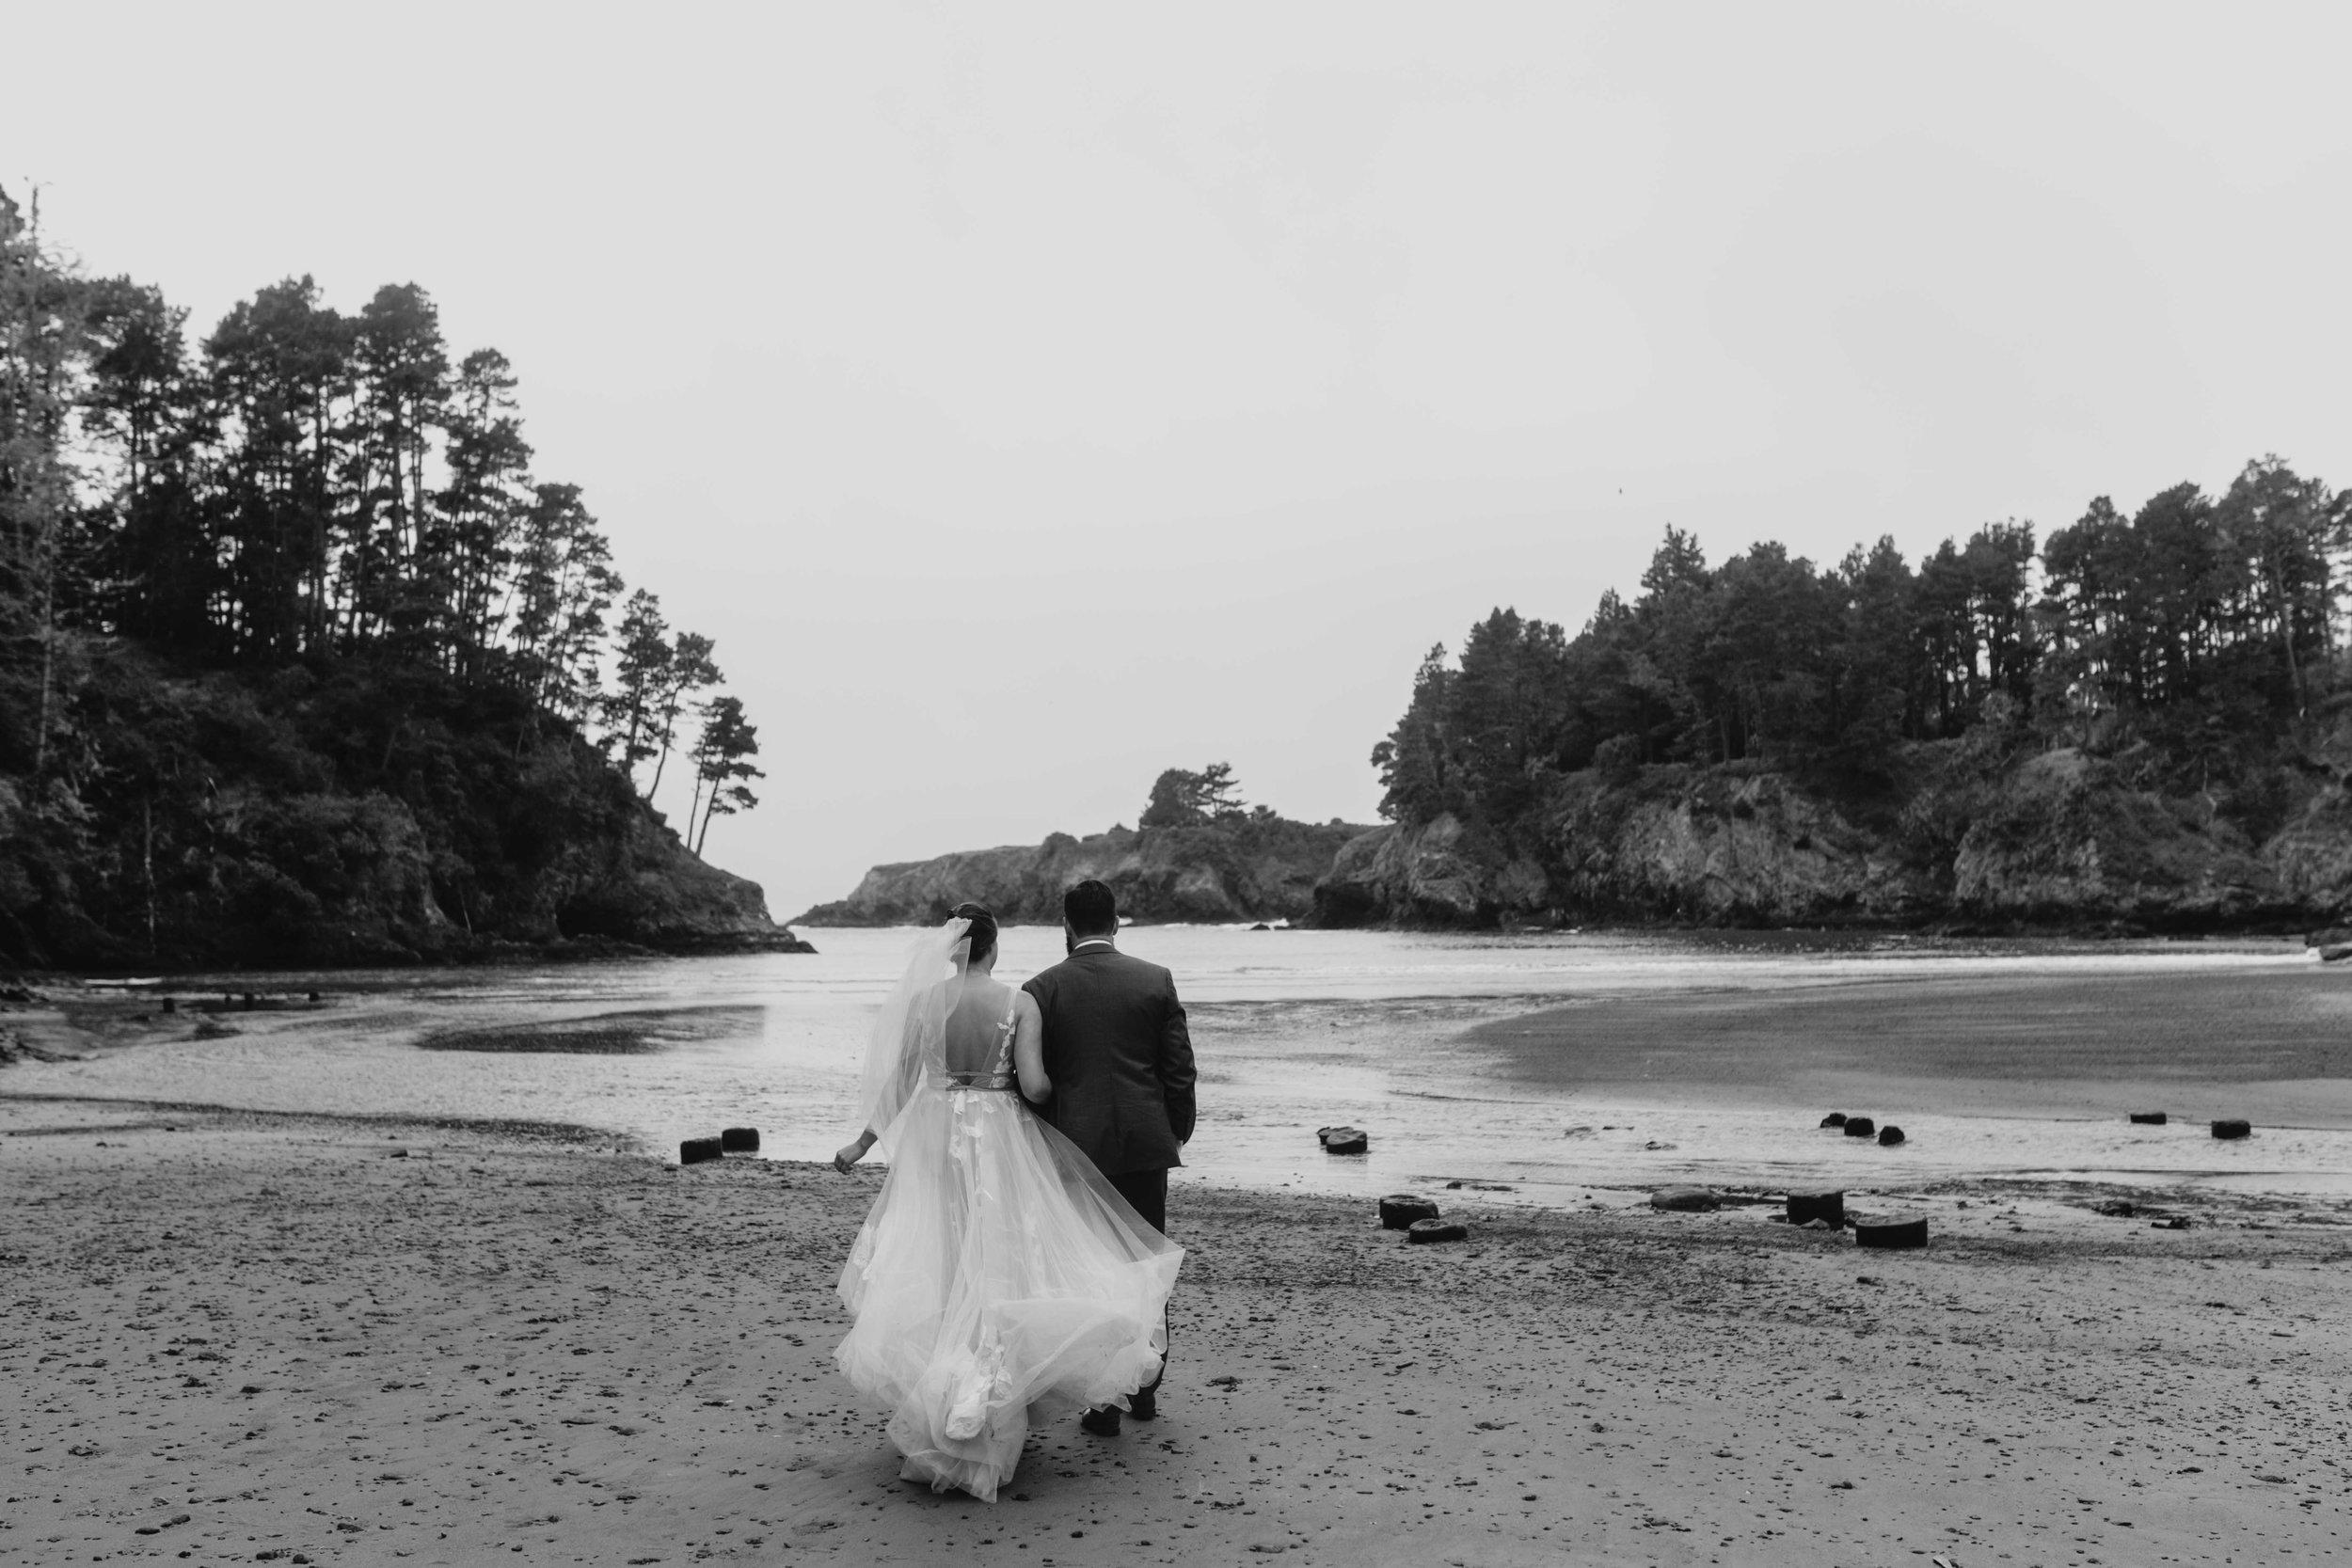 beach elopement spokane couple bride and groom wedding